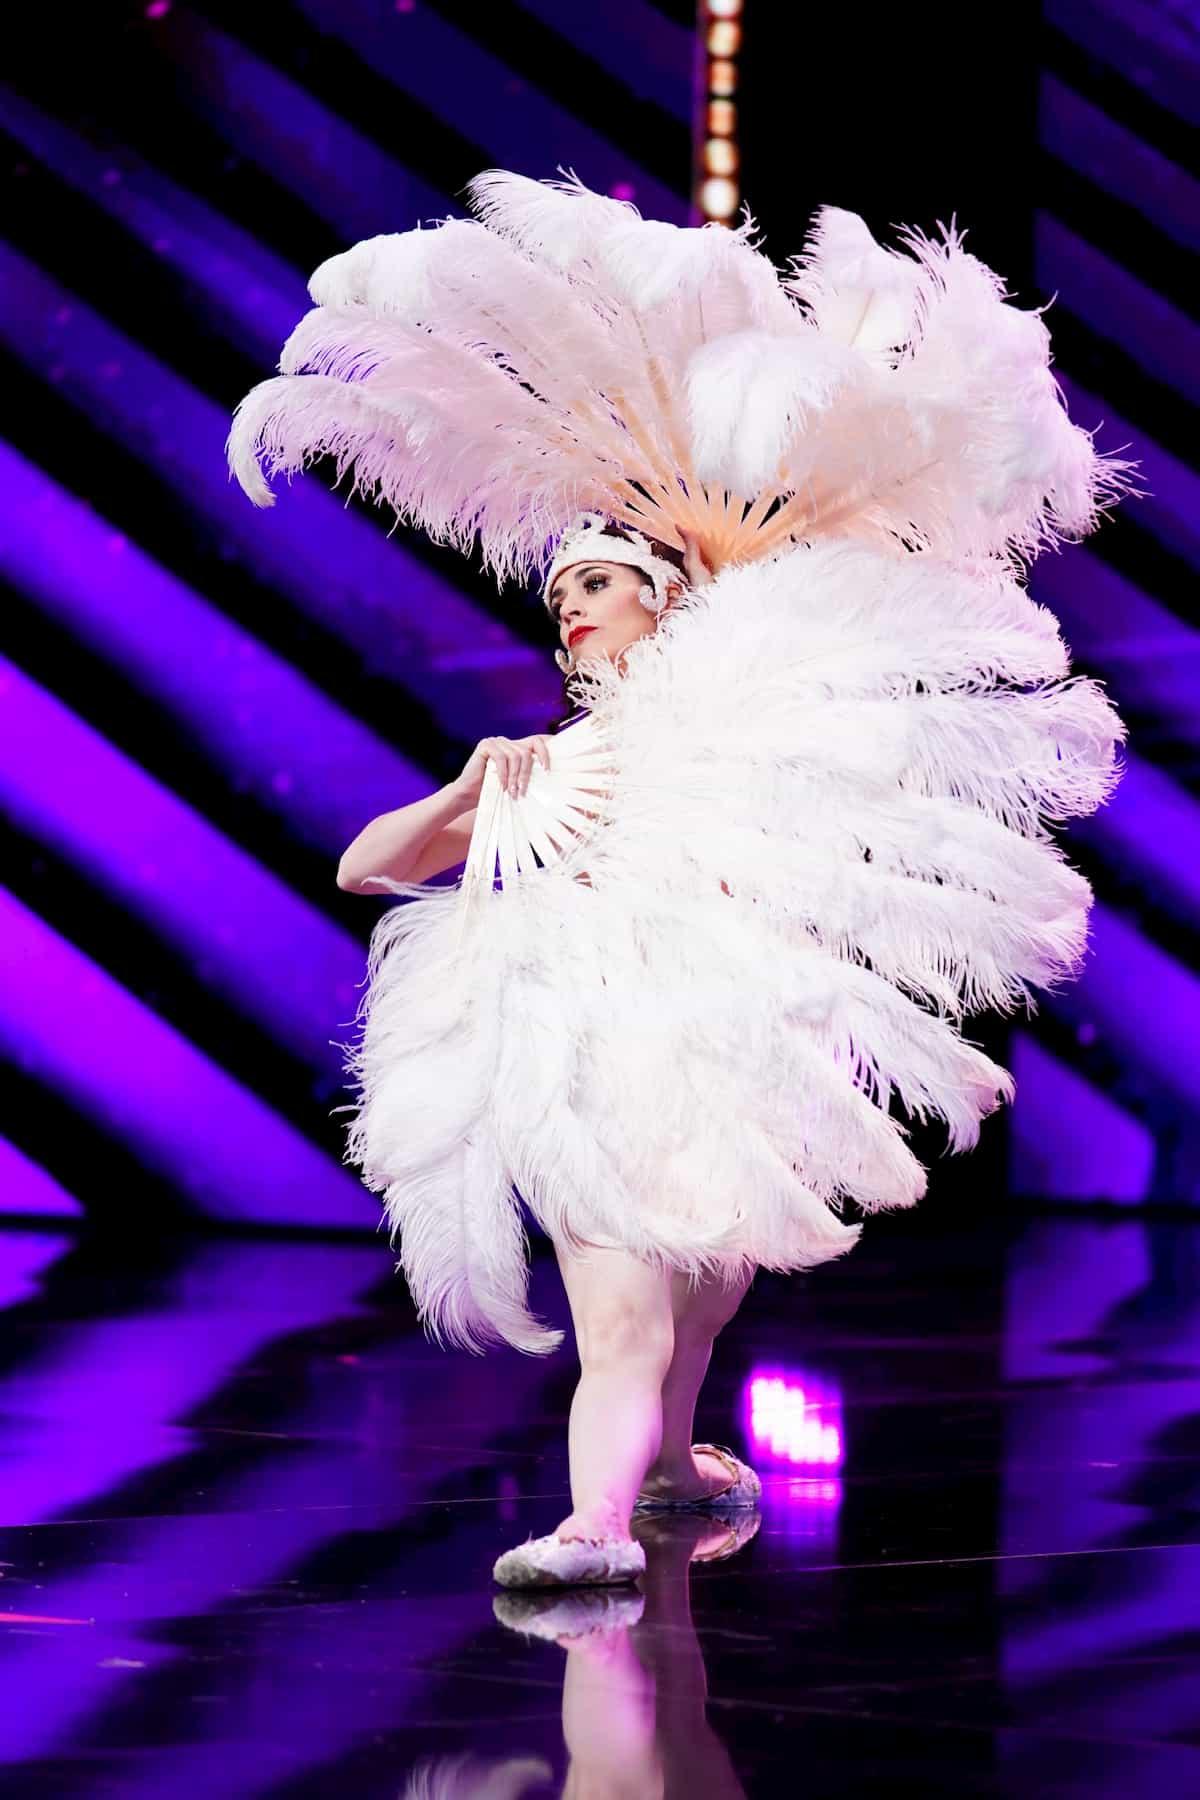 Mademoiselle Parfait de la Neige Kandidatin beim Supertalent am 28.11.2020